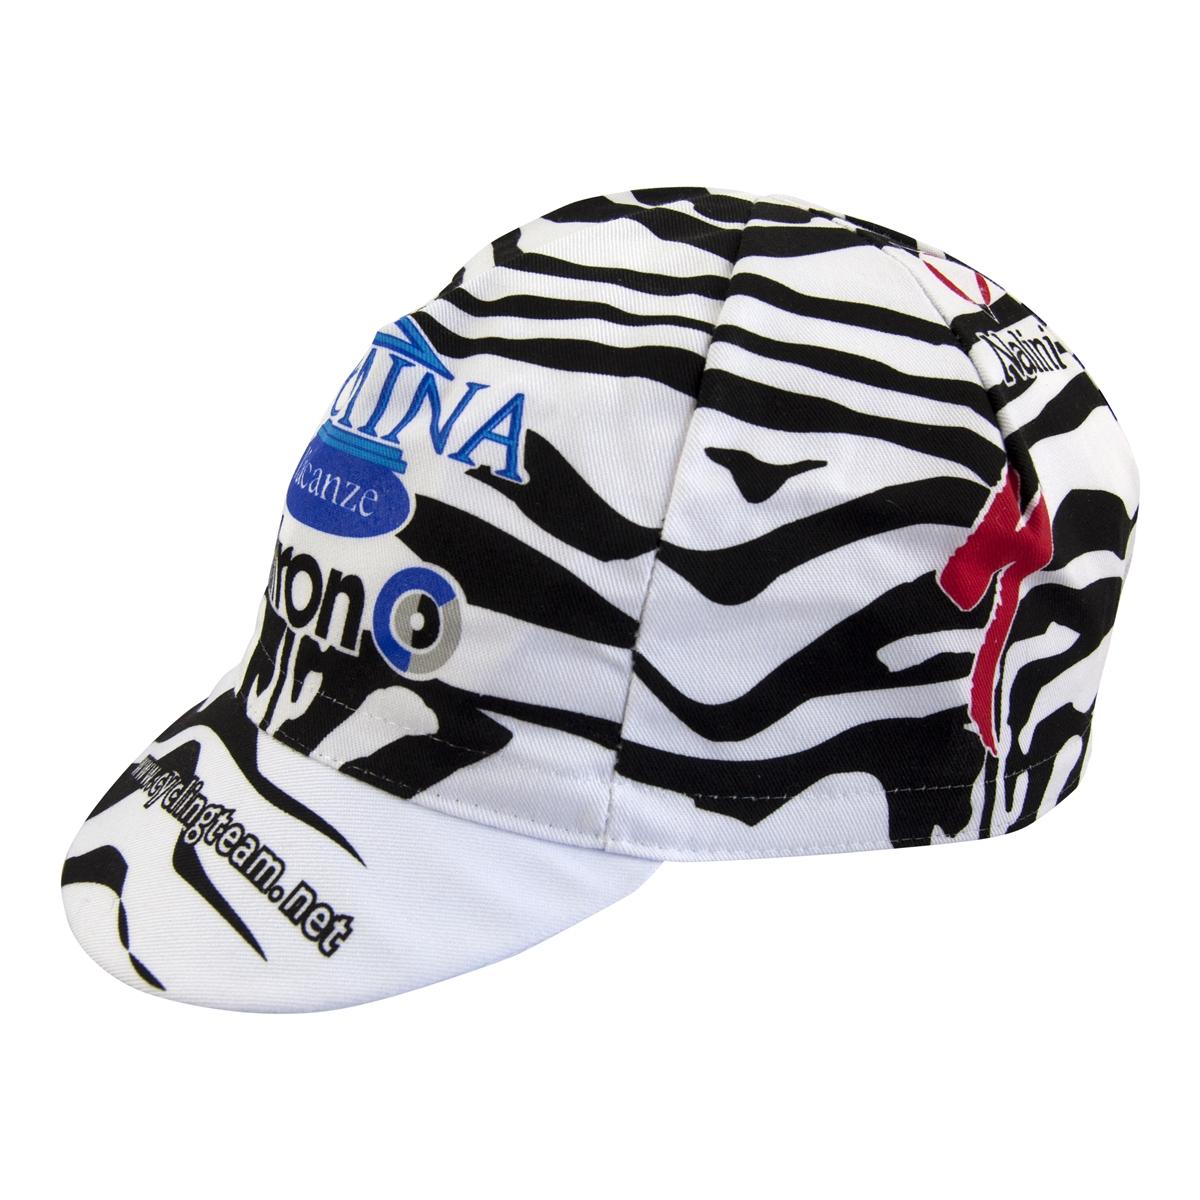 Domina Vacanza Retro Pro Team Cycling Cap 6eb83d48b